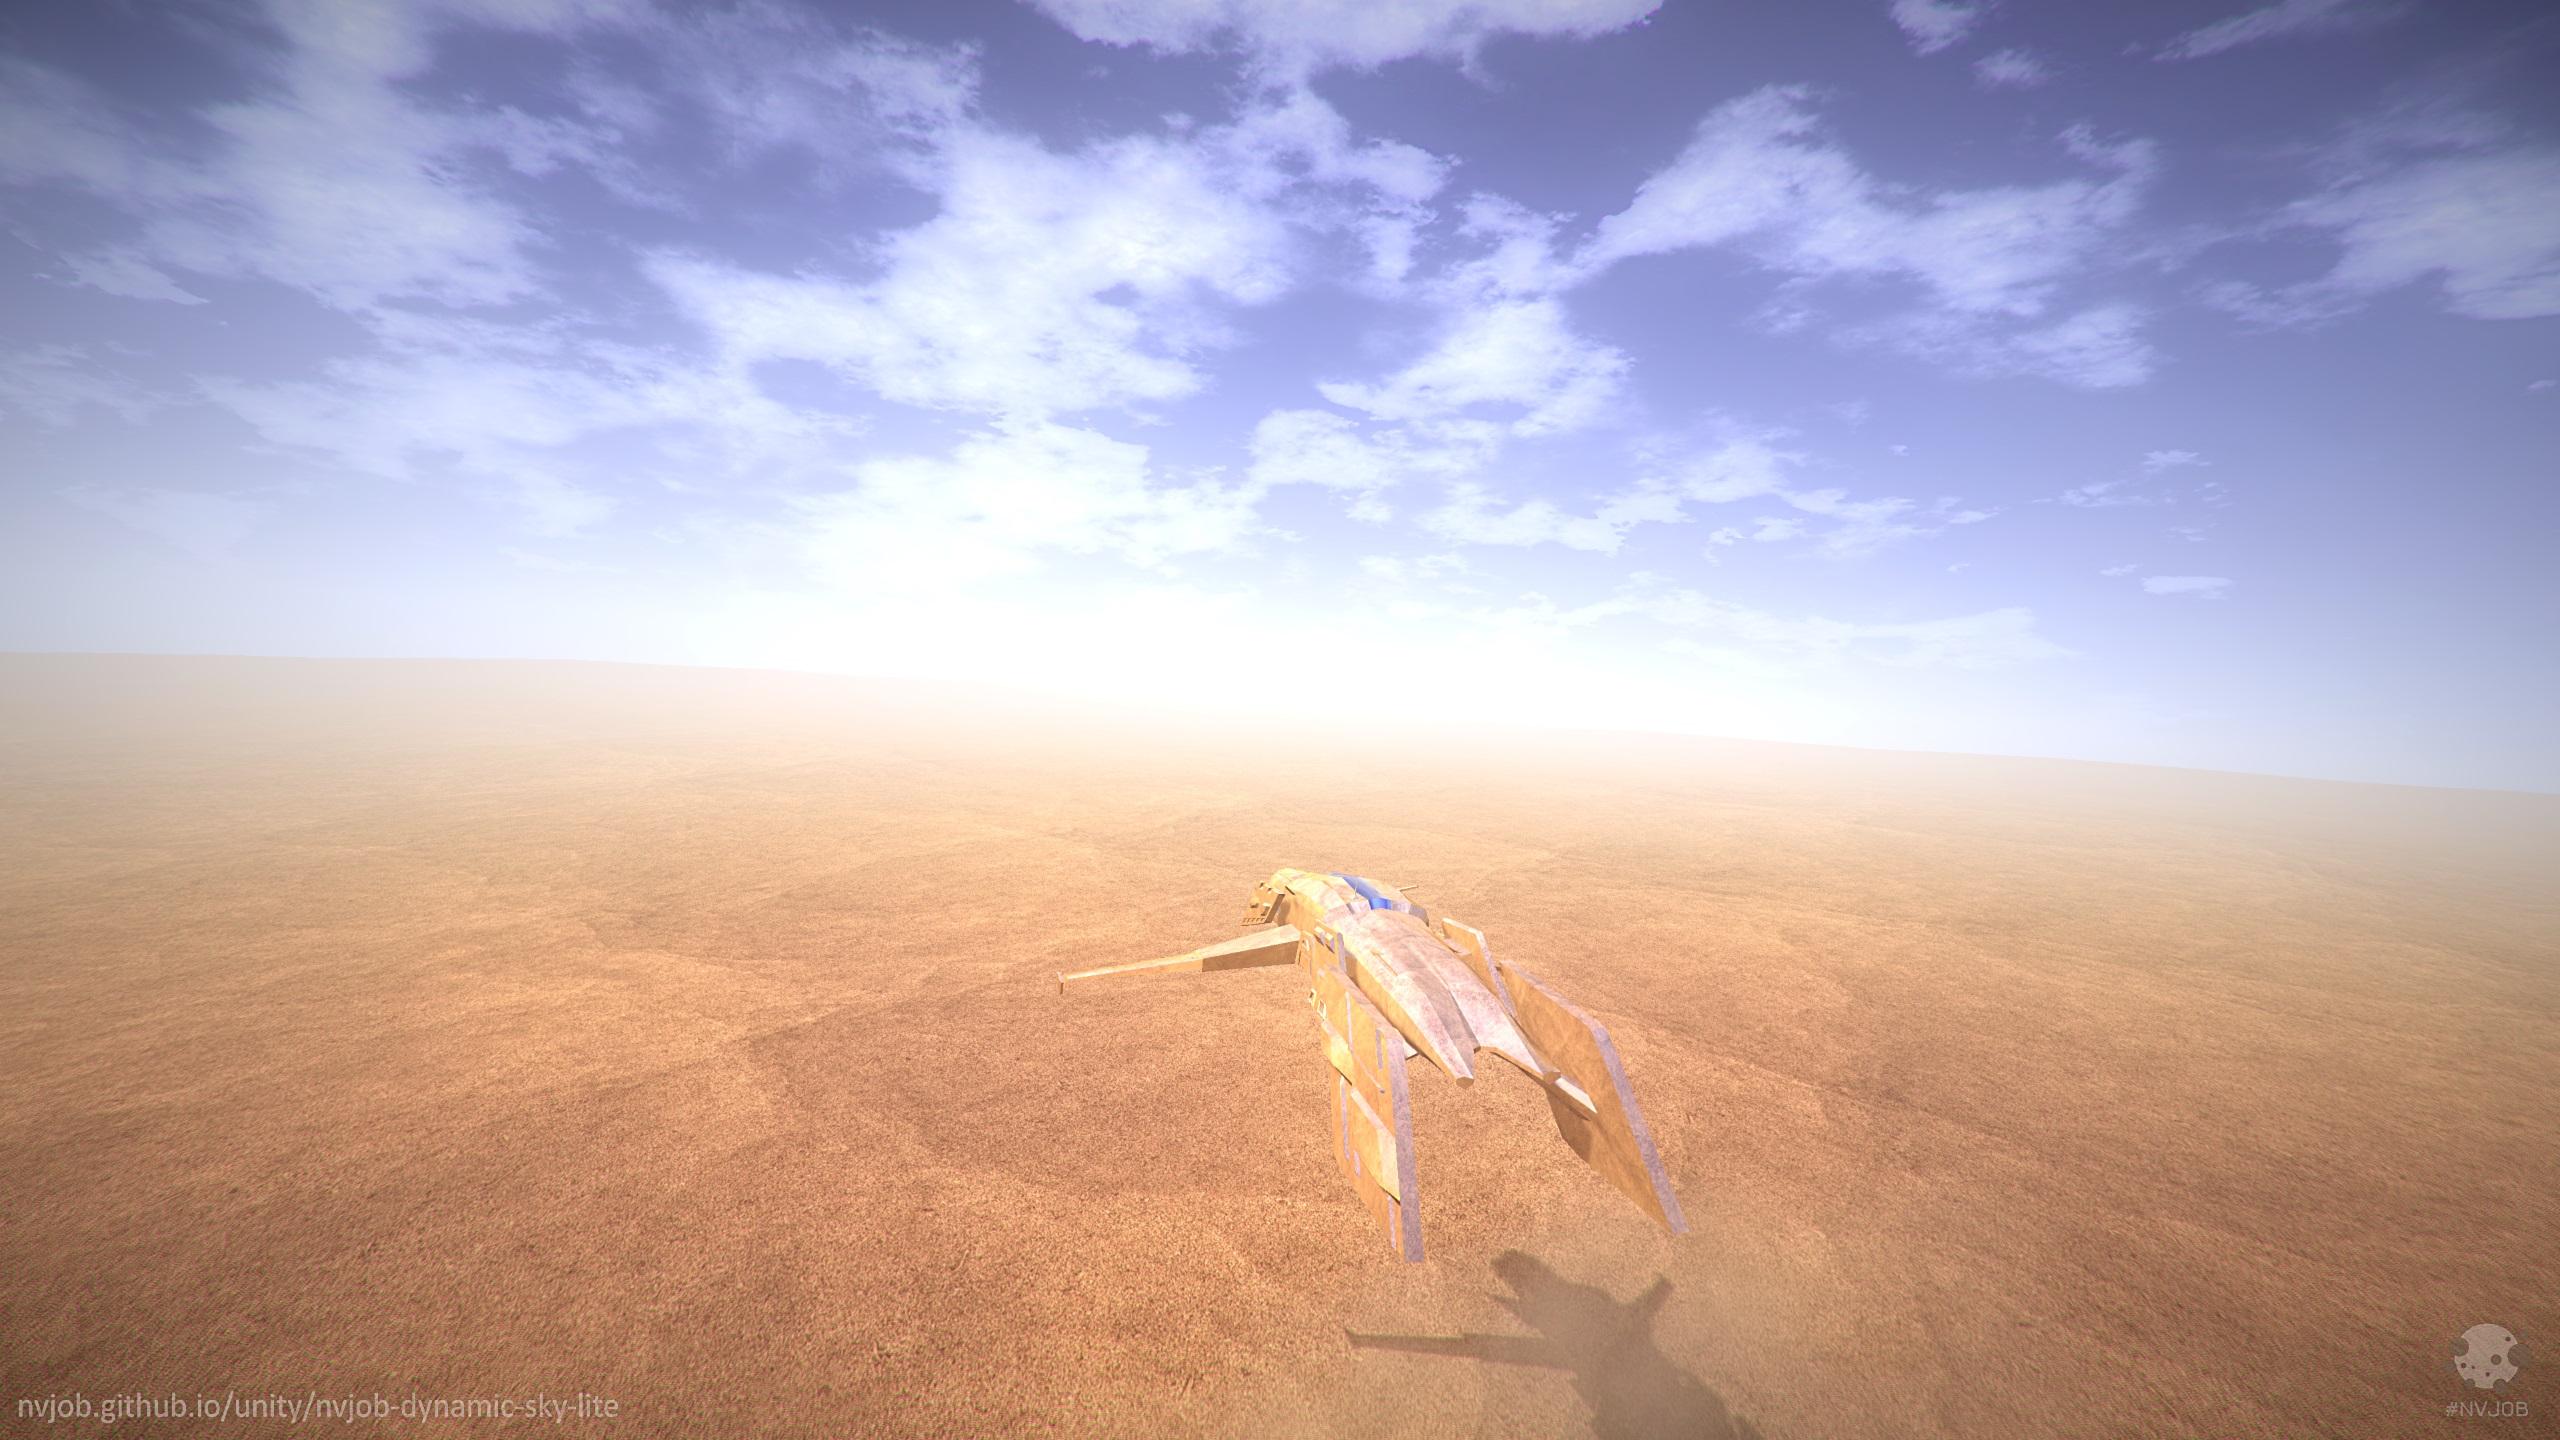 #NVJOB Nicholas Veselov (nvjob.github.io) | Dynamic Sky Lite (standard render) Unity Asset